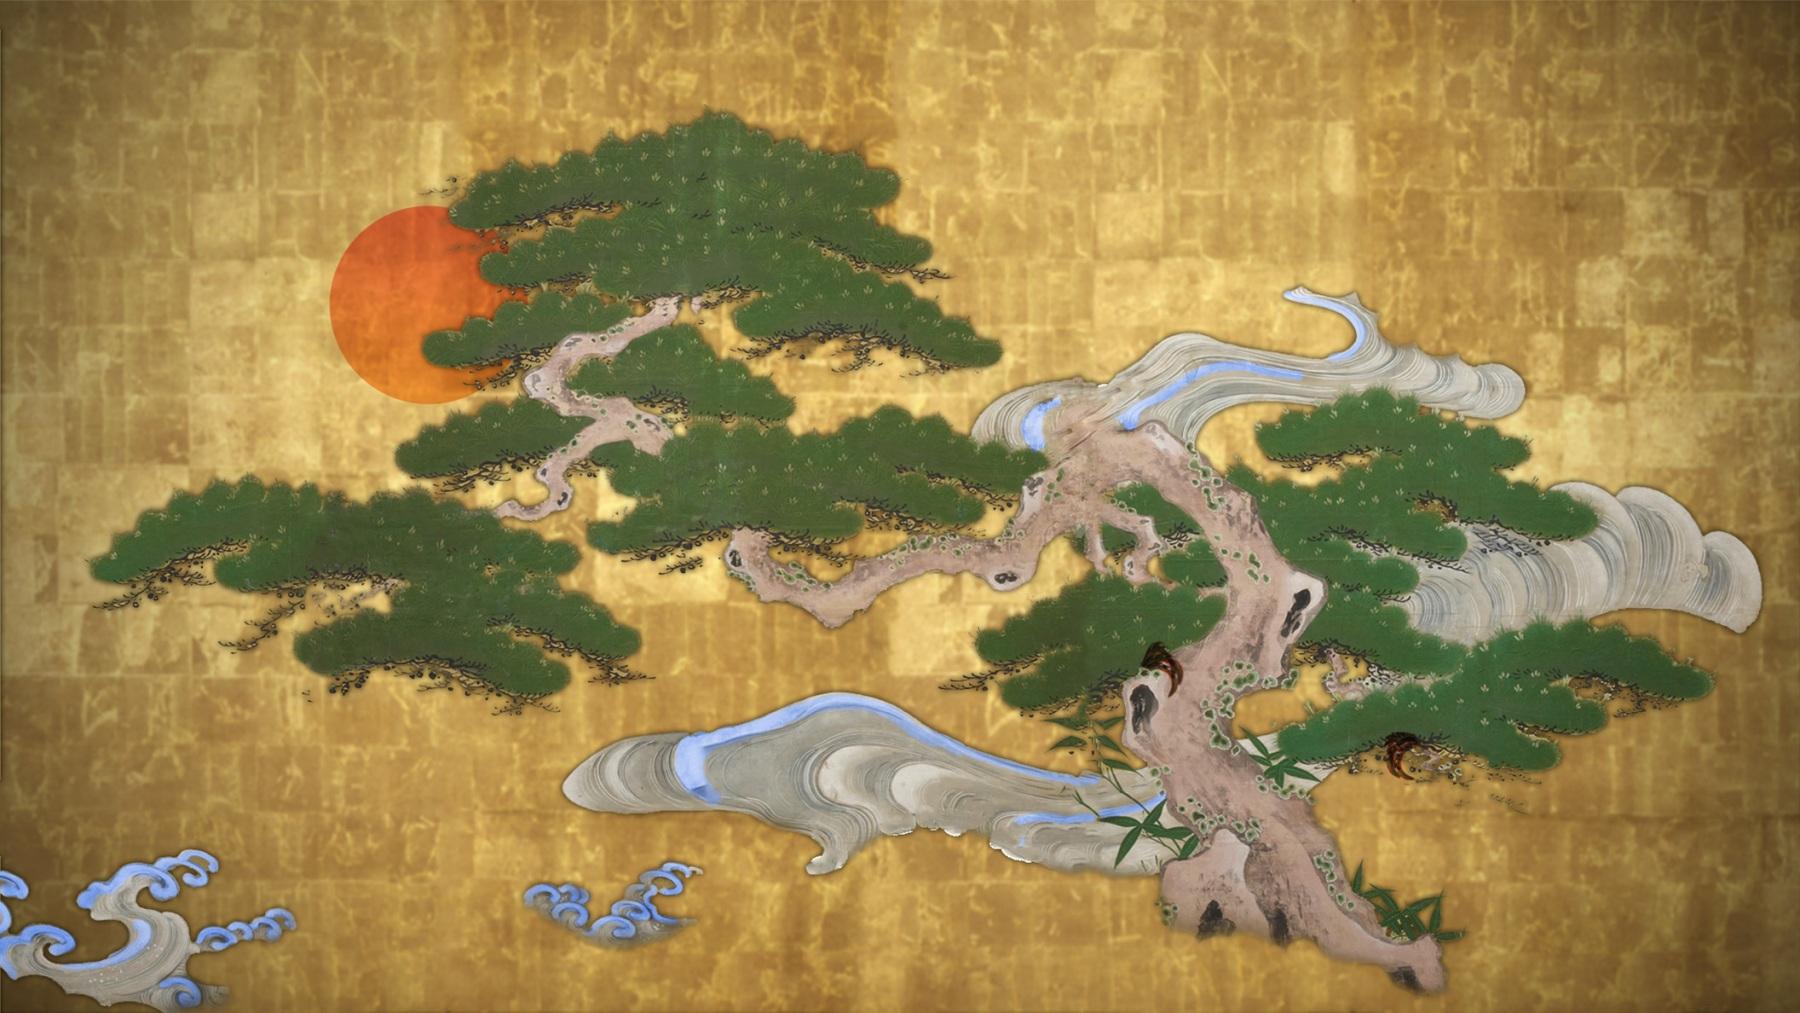 Pine Tree Background, illustrated by Laura Nigon-Holmgren.